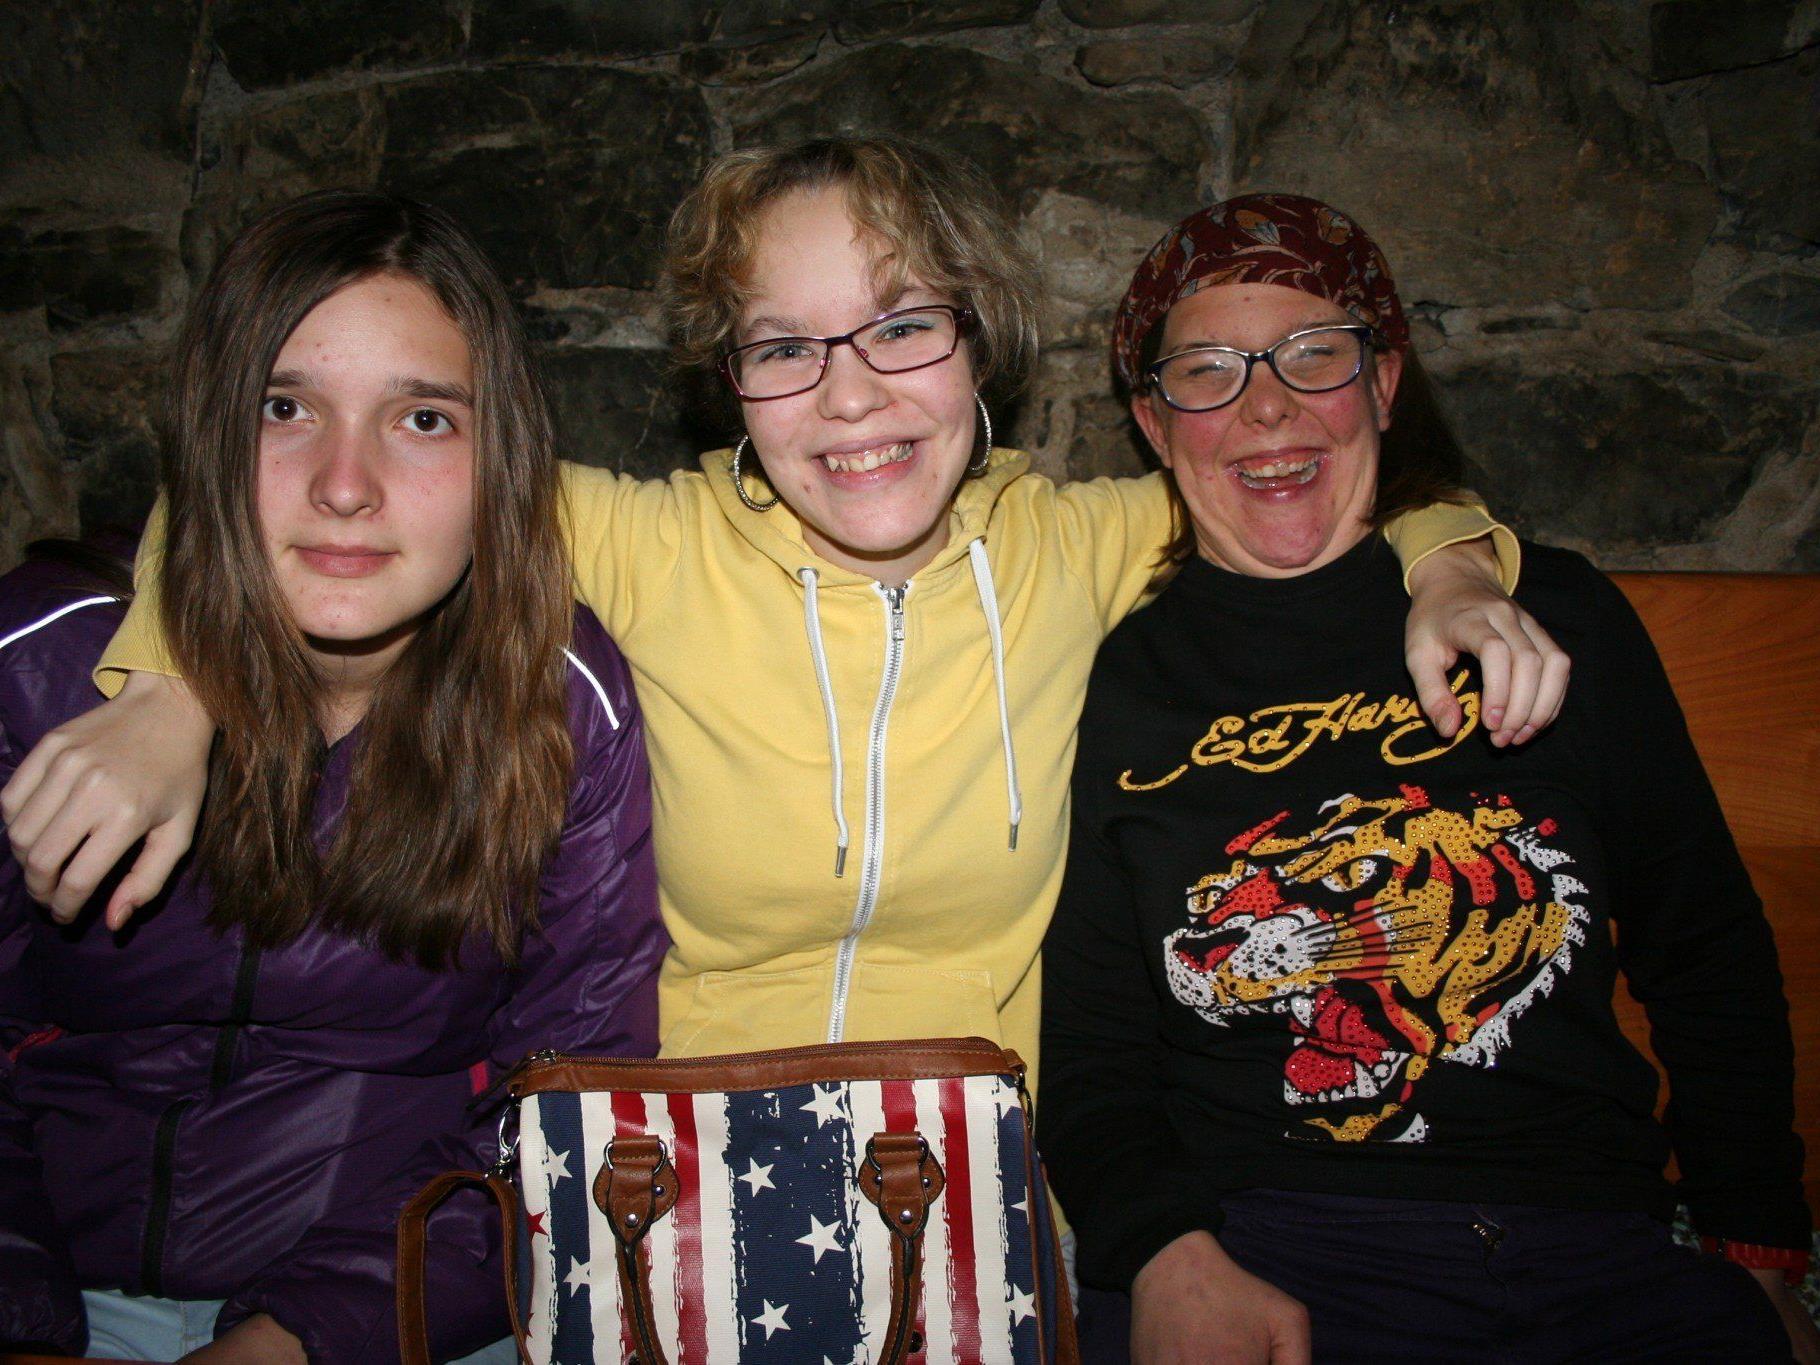 Hannah, Rebekka und Dorothee.